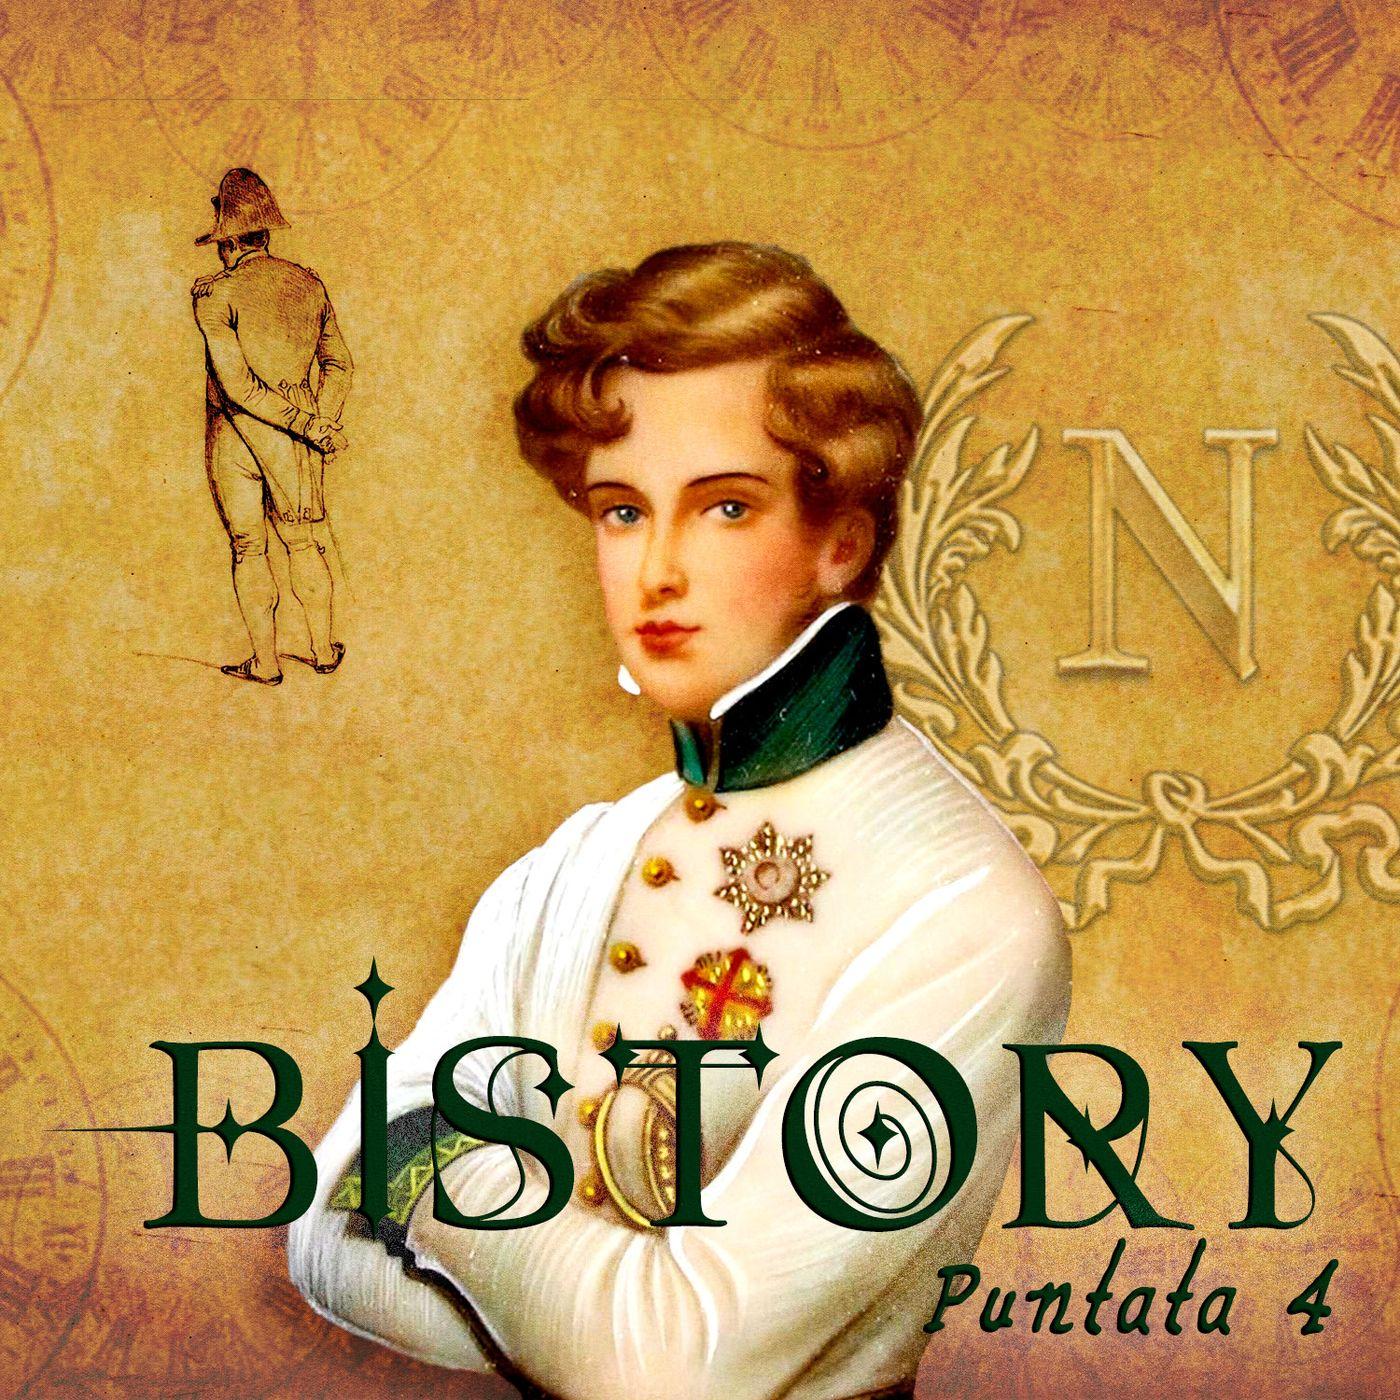 Bistory S01E04 Napoleone II